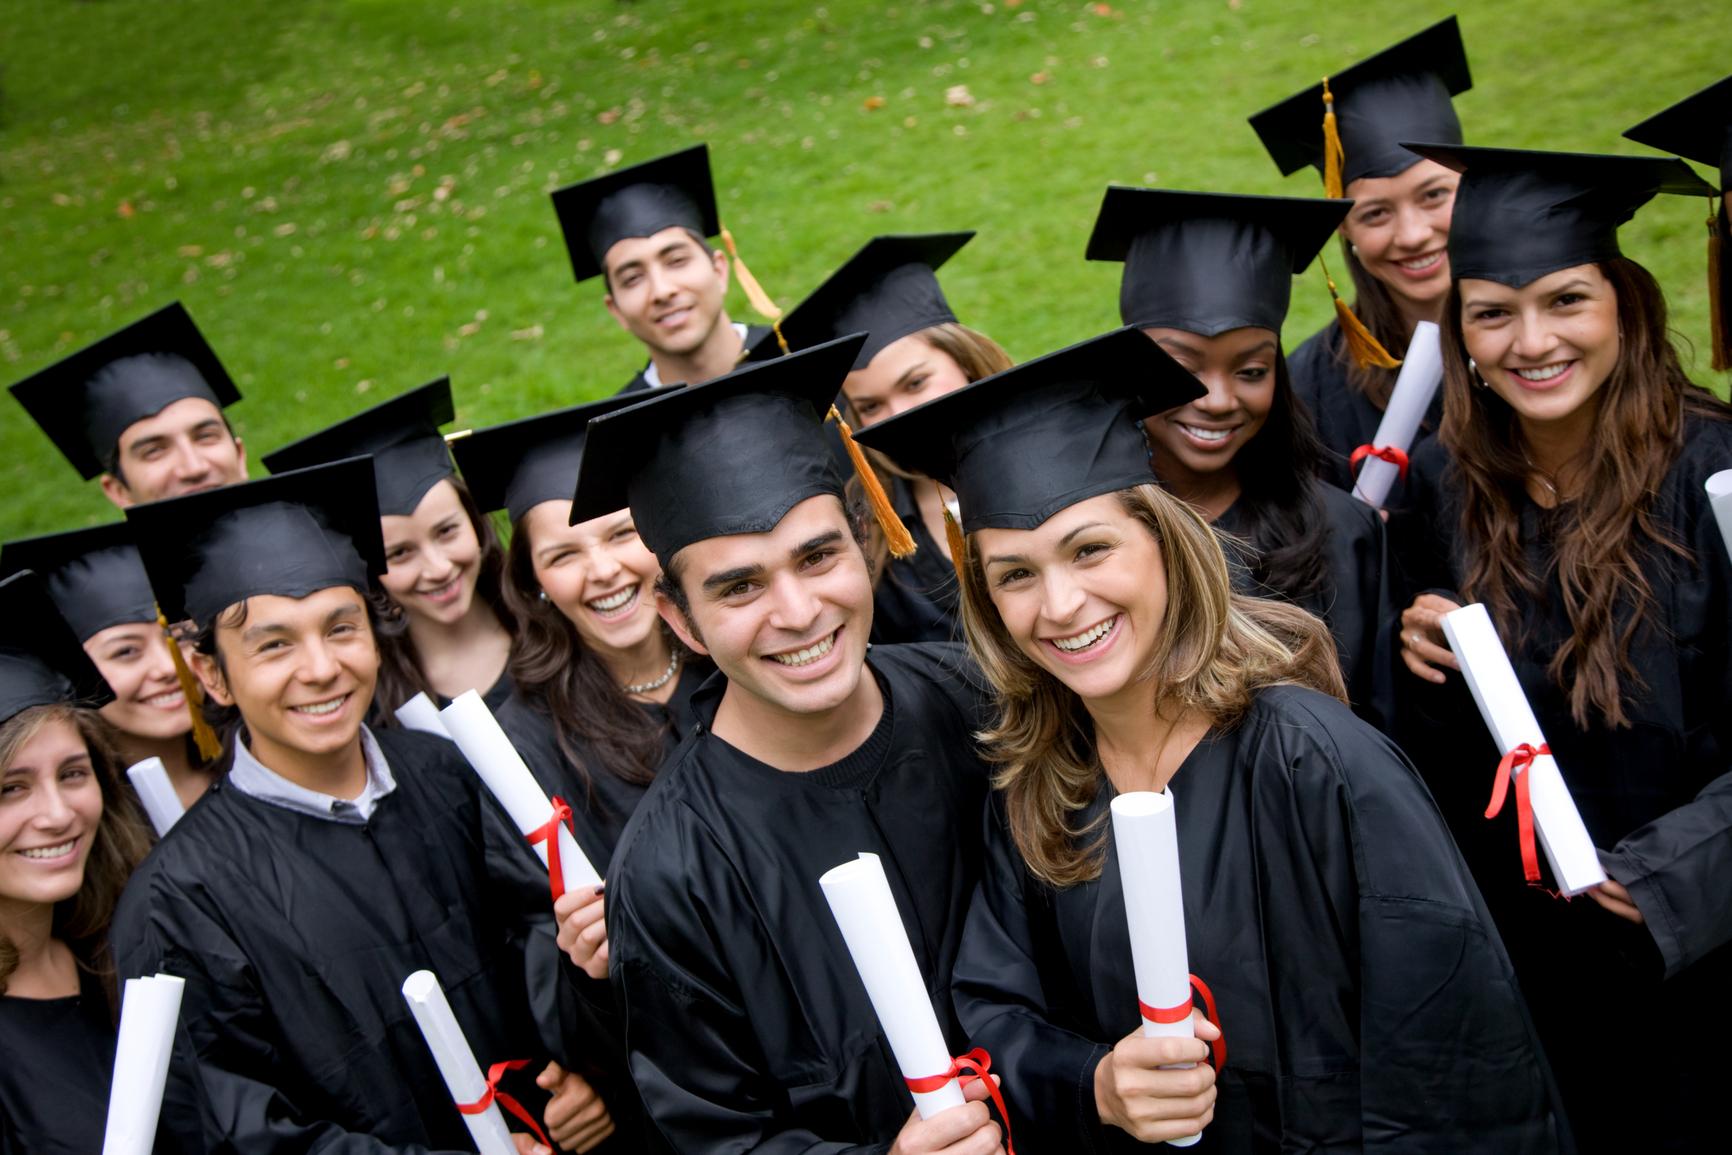 Graduation-Students2.jpg